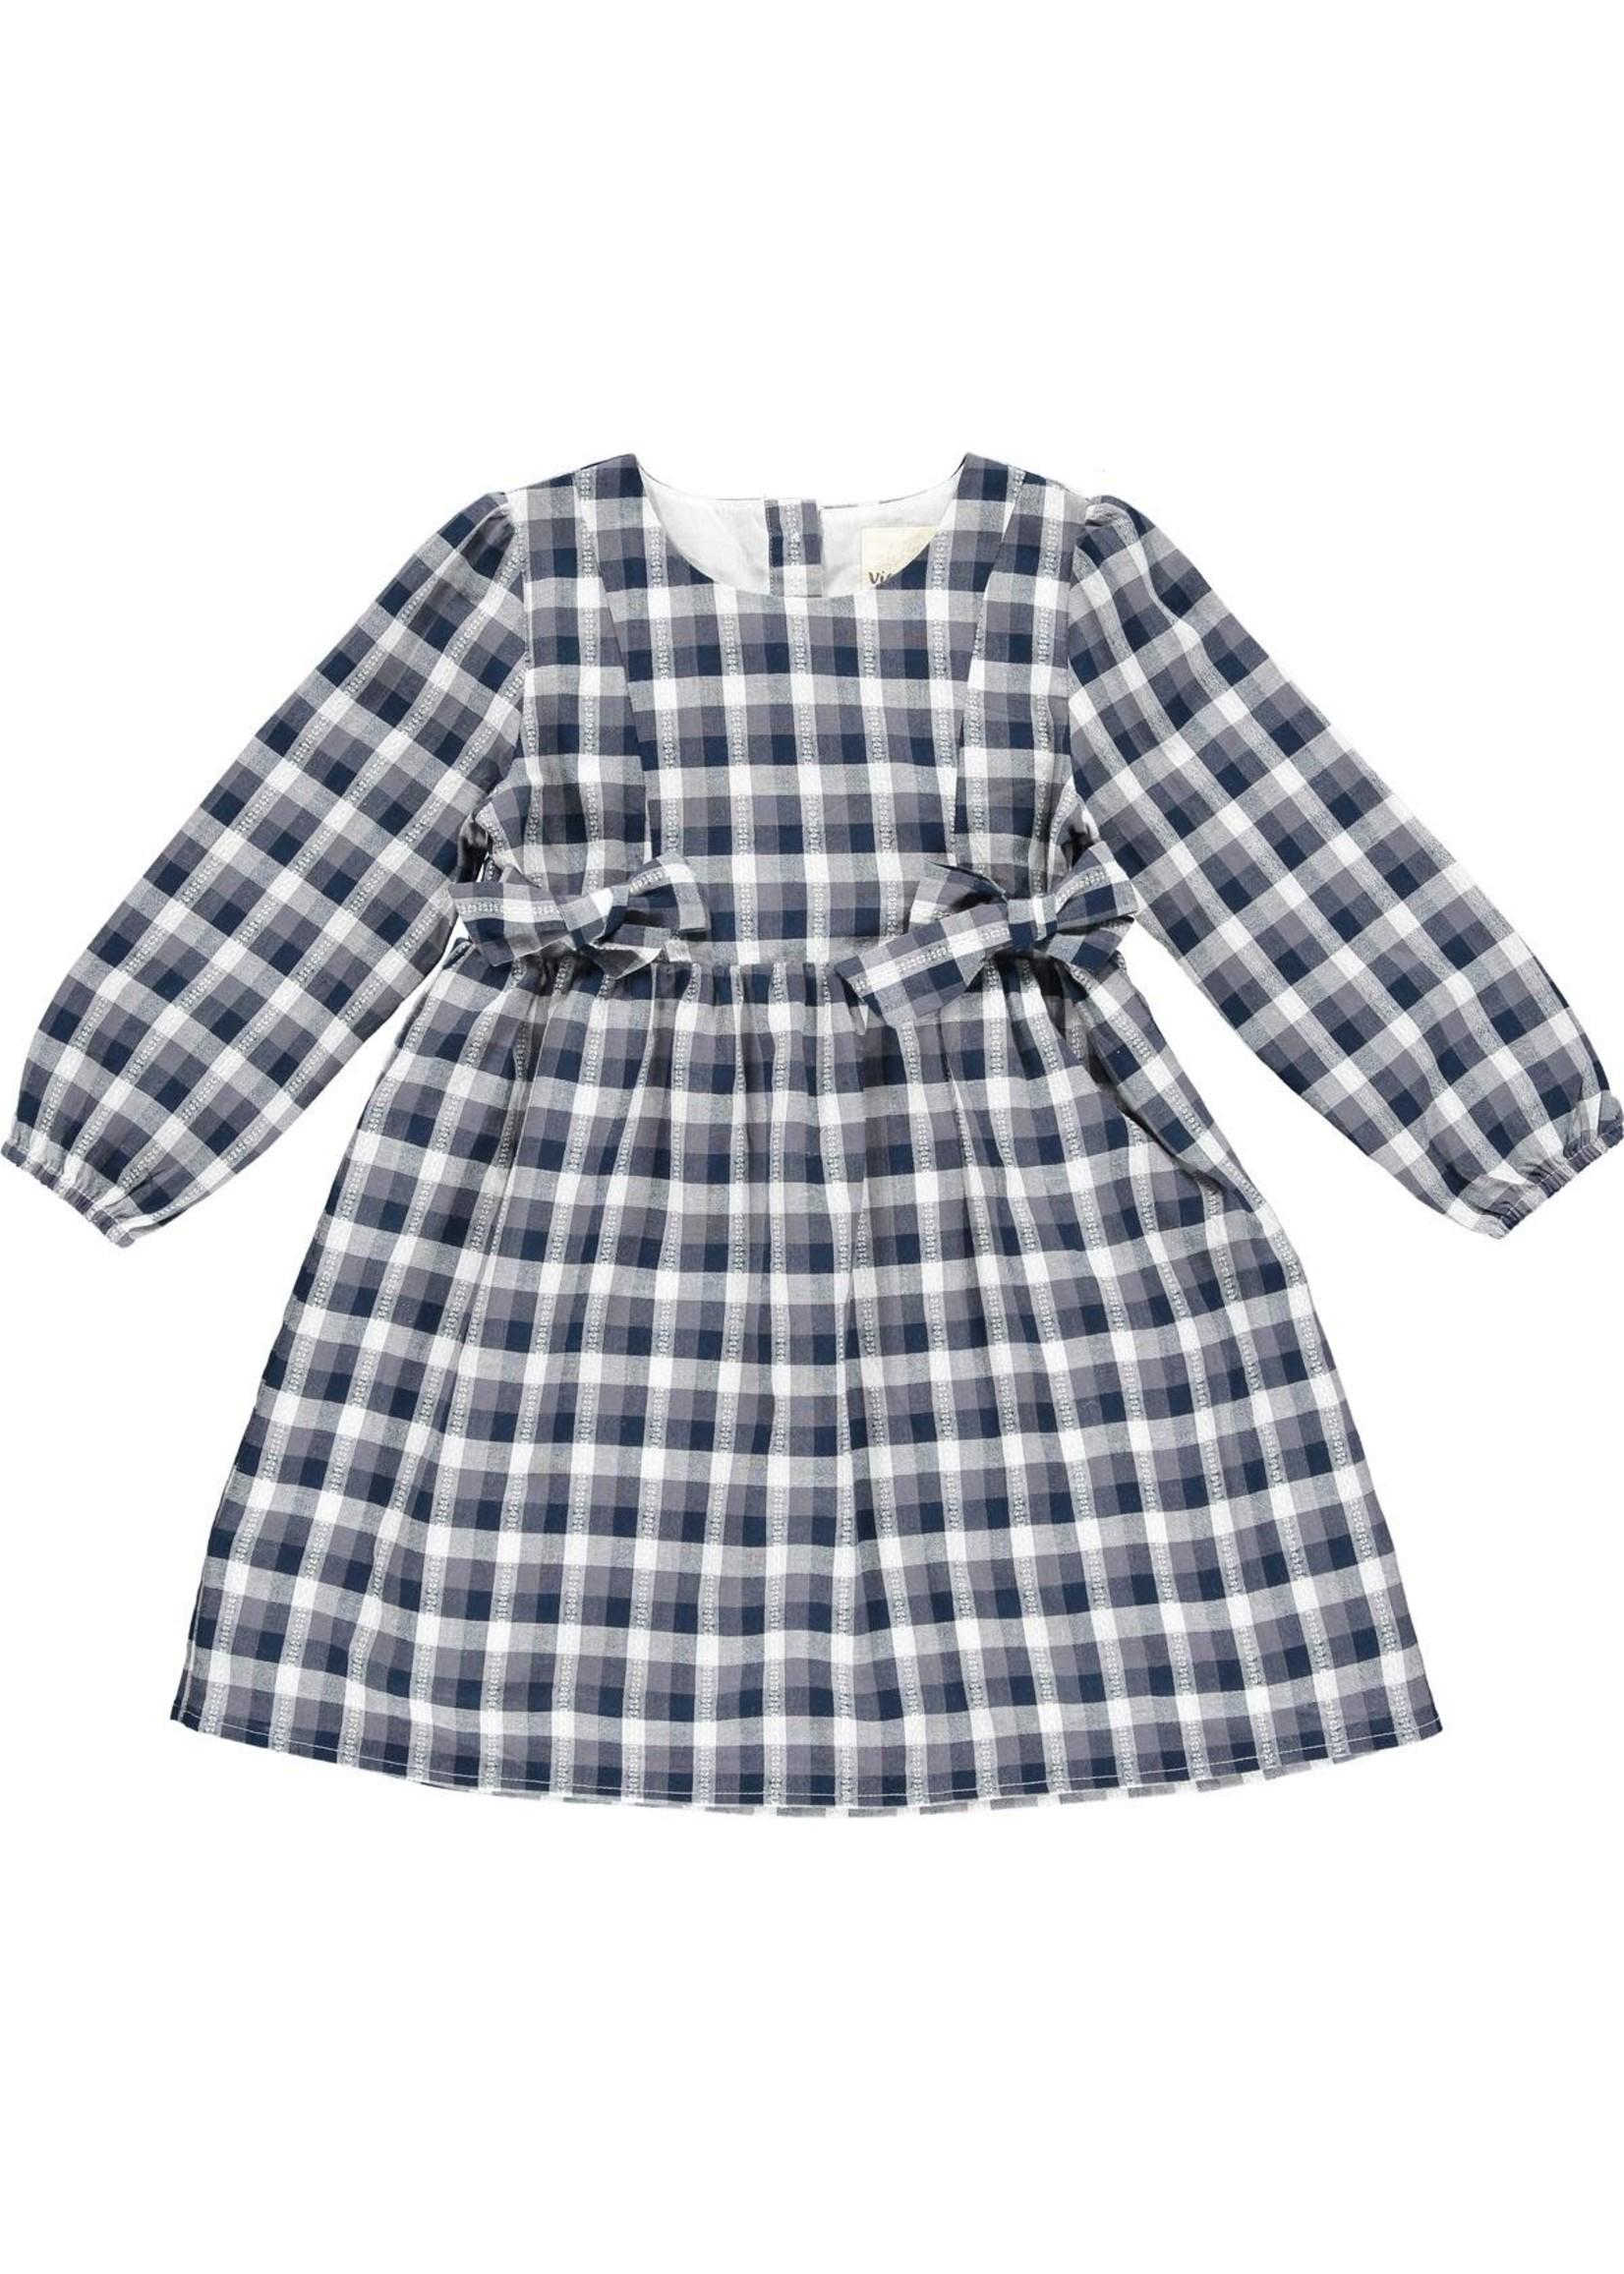 Vignette V. Autumn Dress